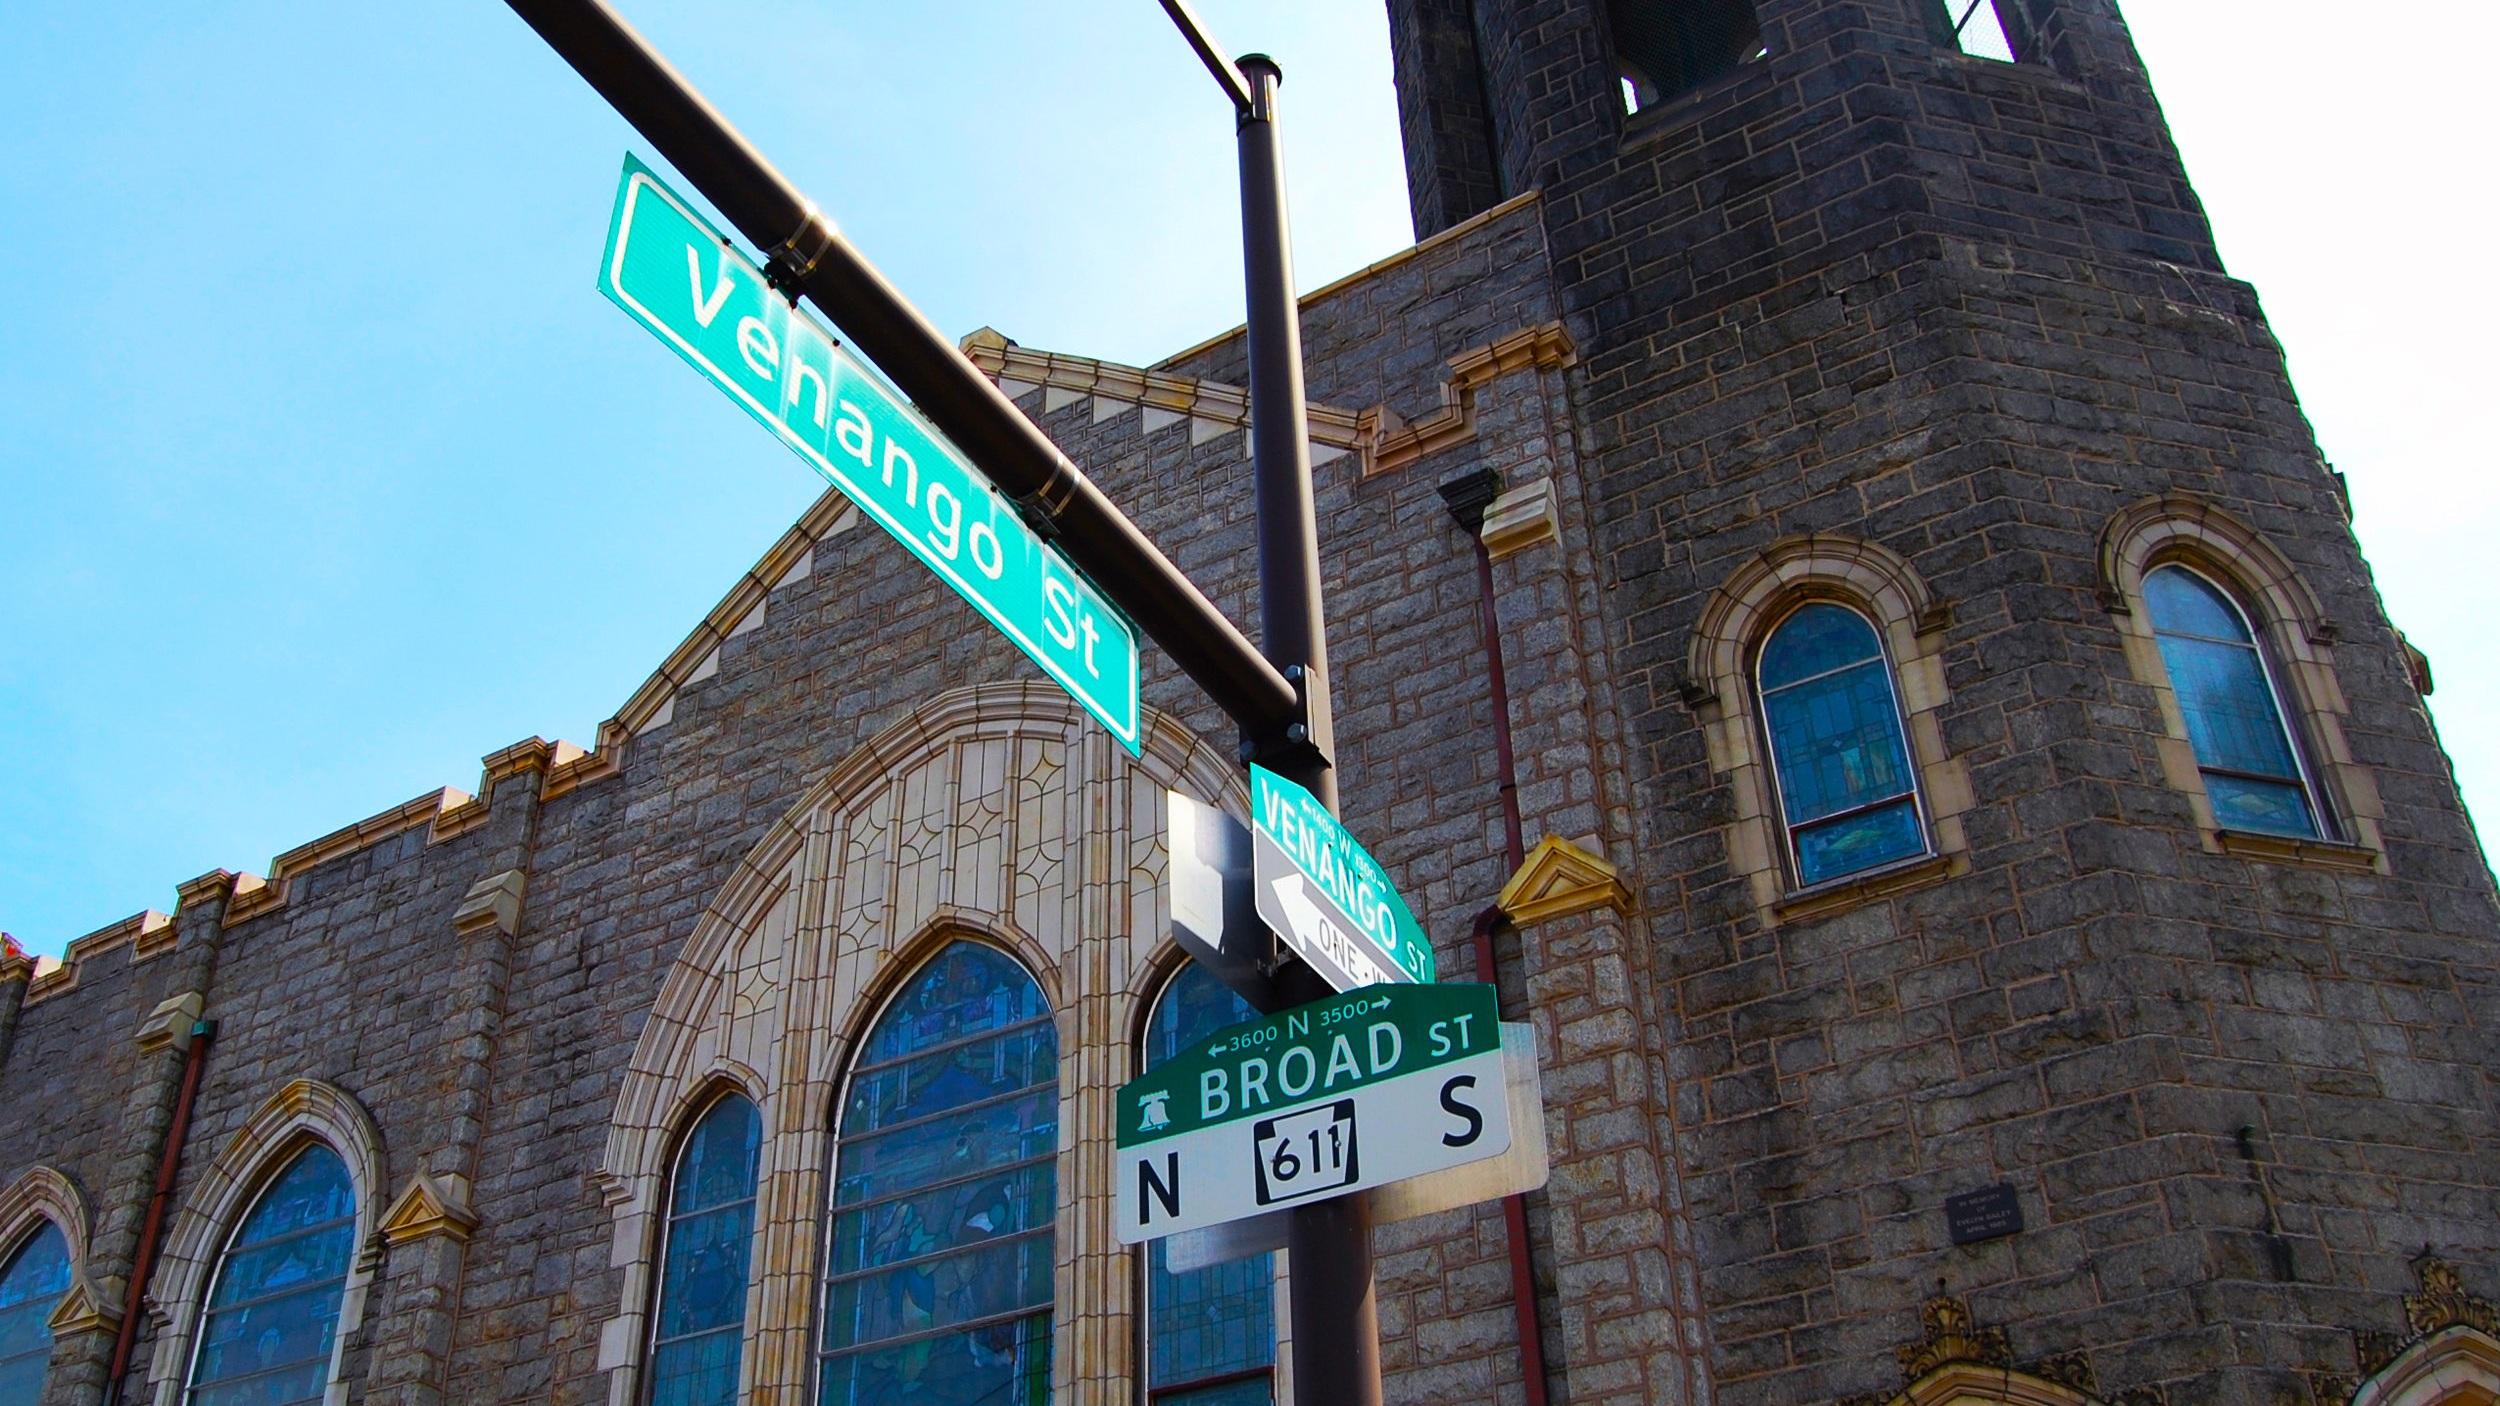 CORRIDOR CONNECTIONS - ZION BAPTIST CHURCH